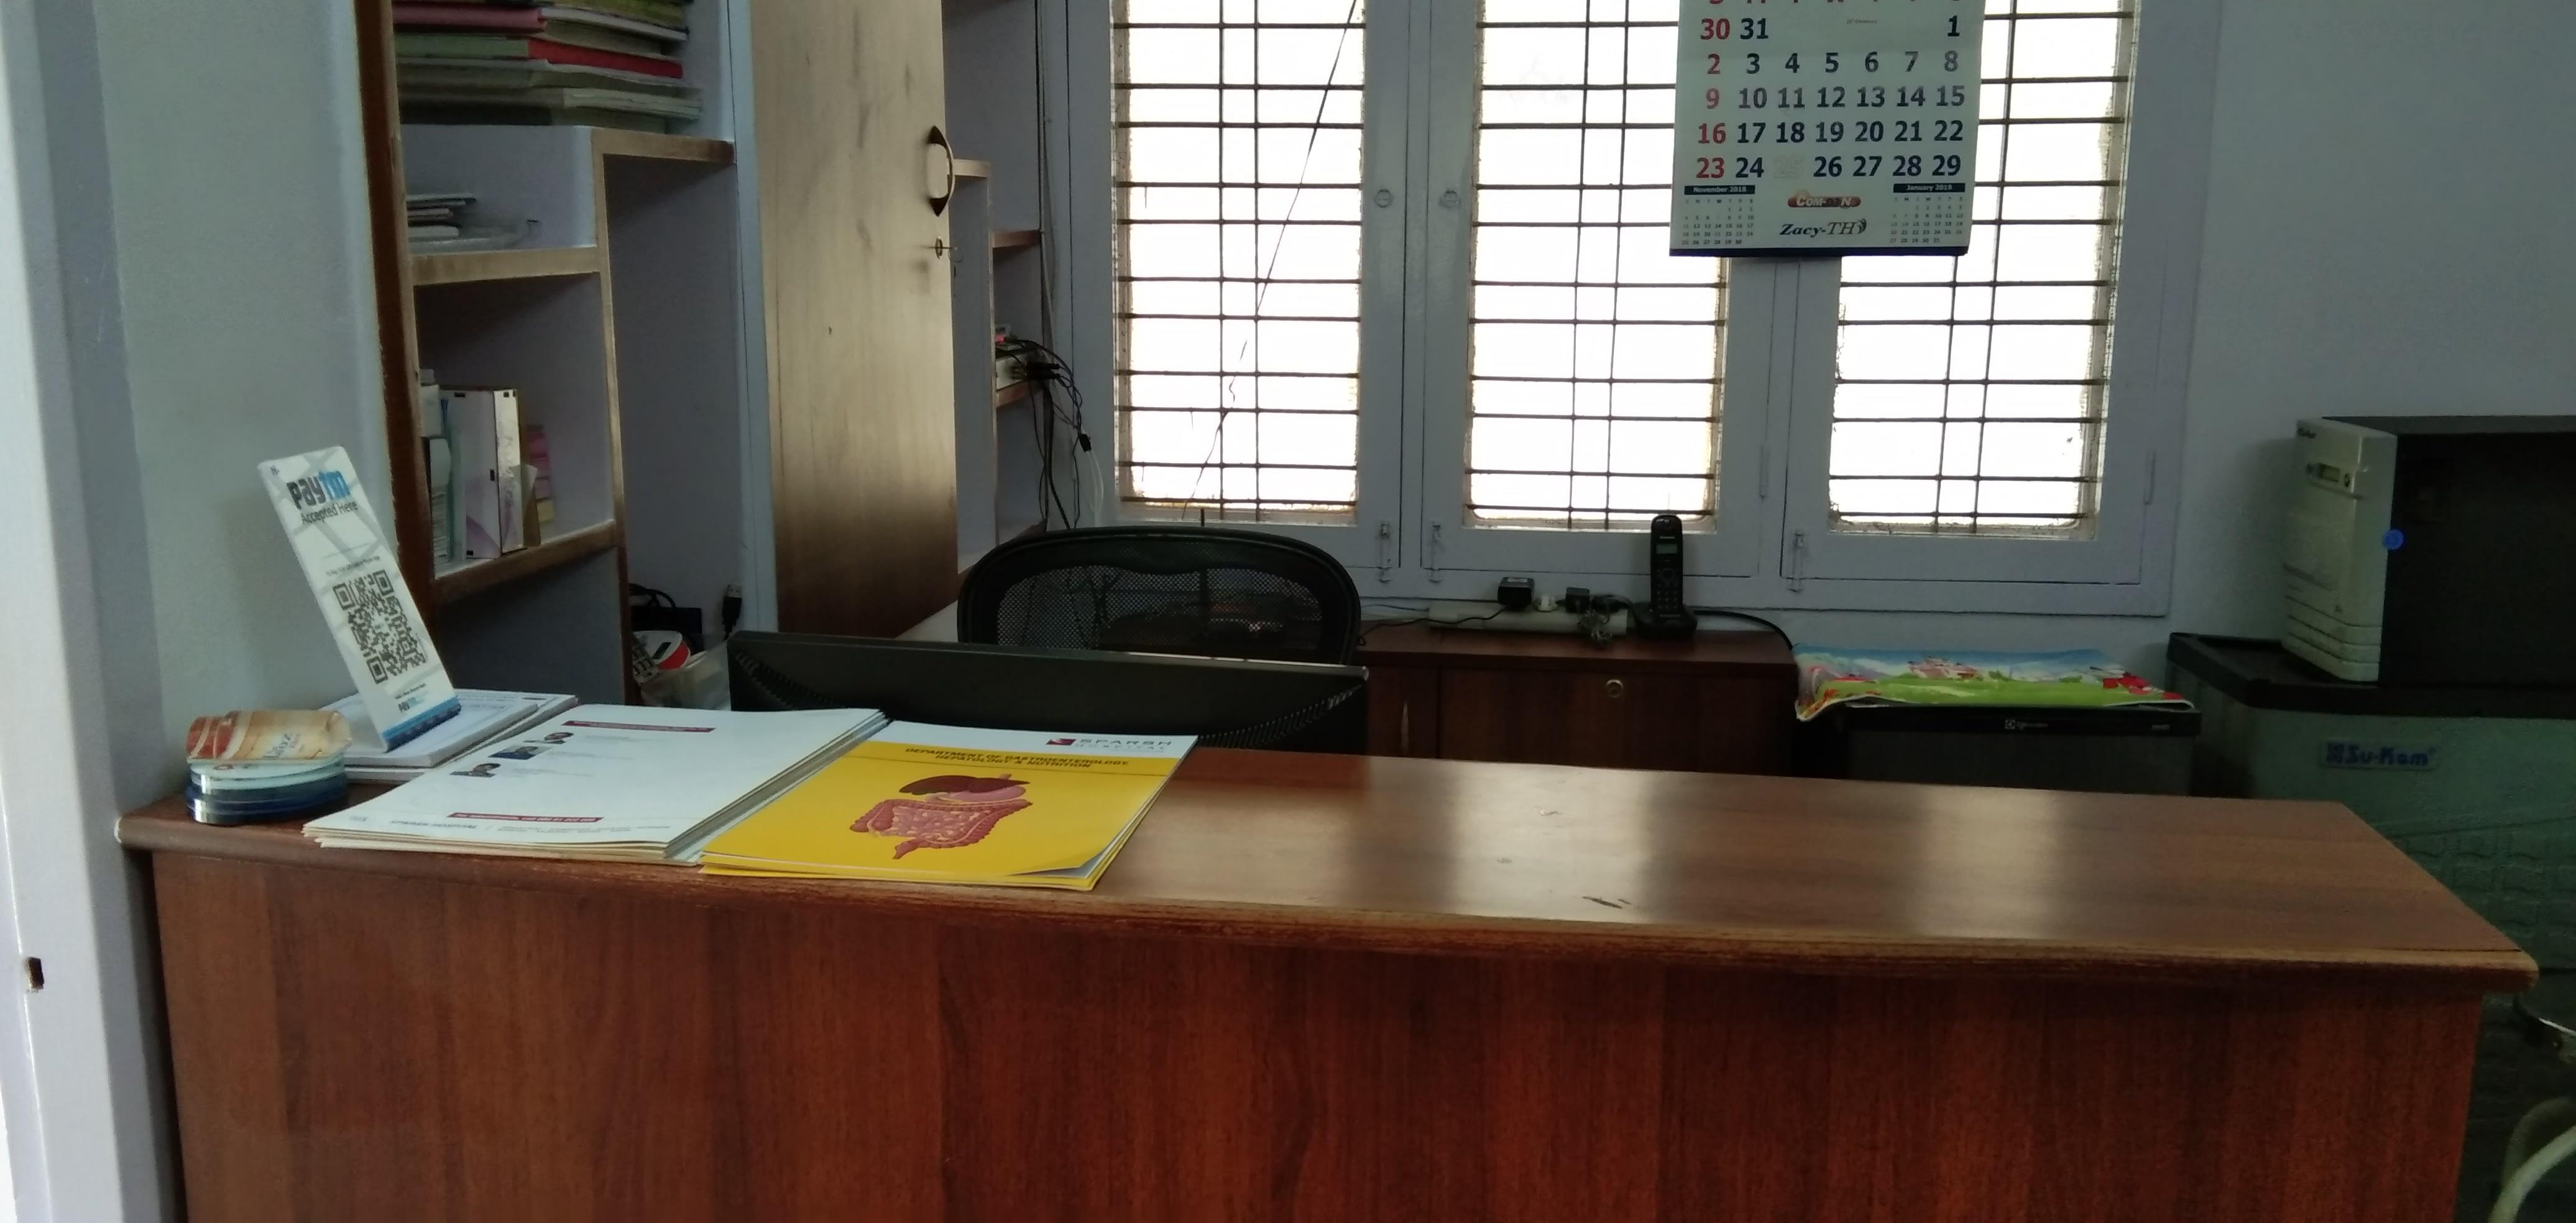 GERD Treatment, Treatment for GERD in Bangalore - View